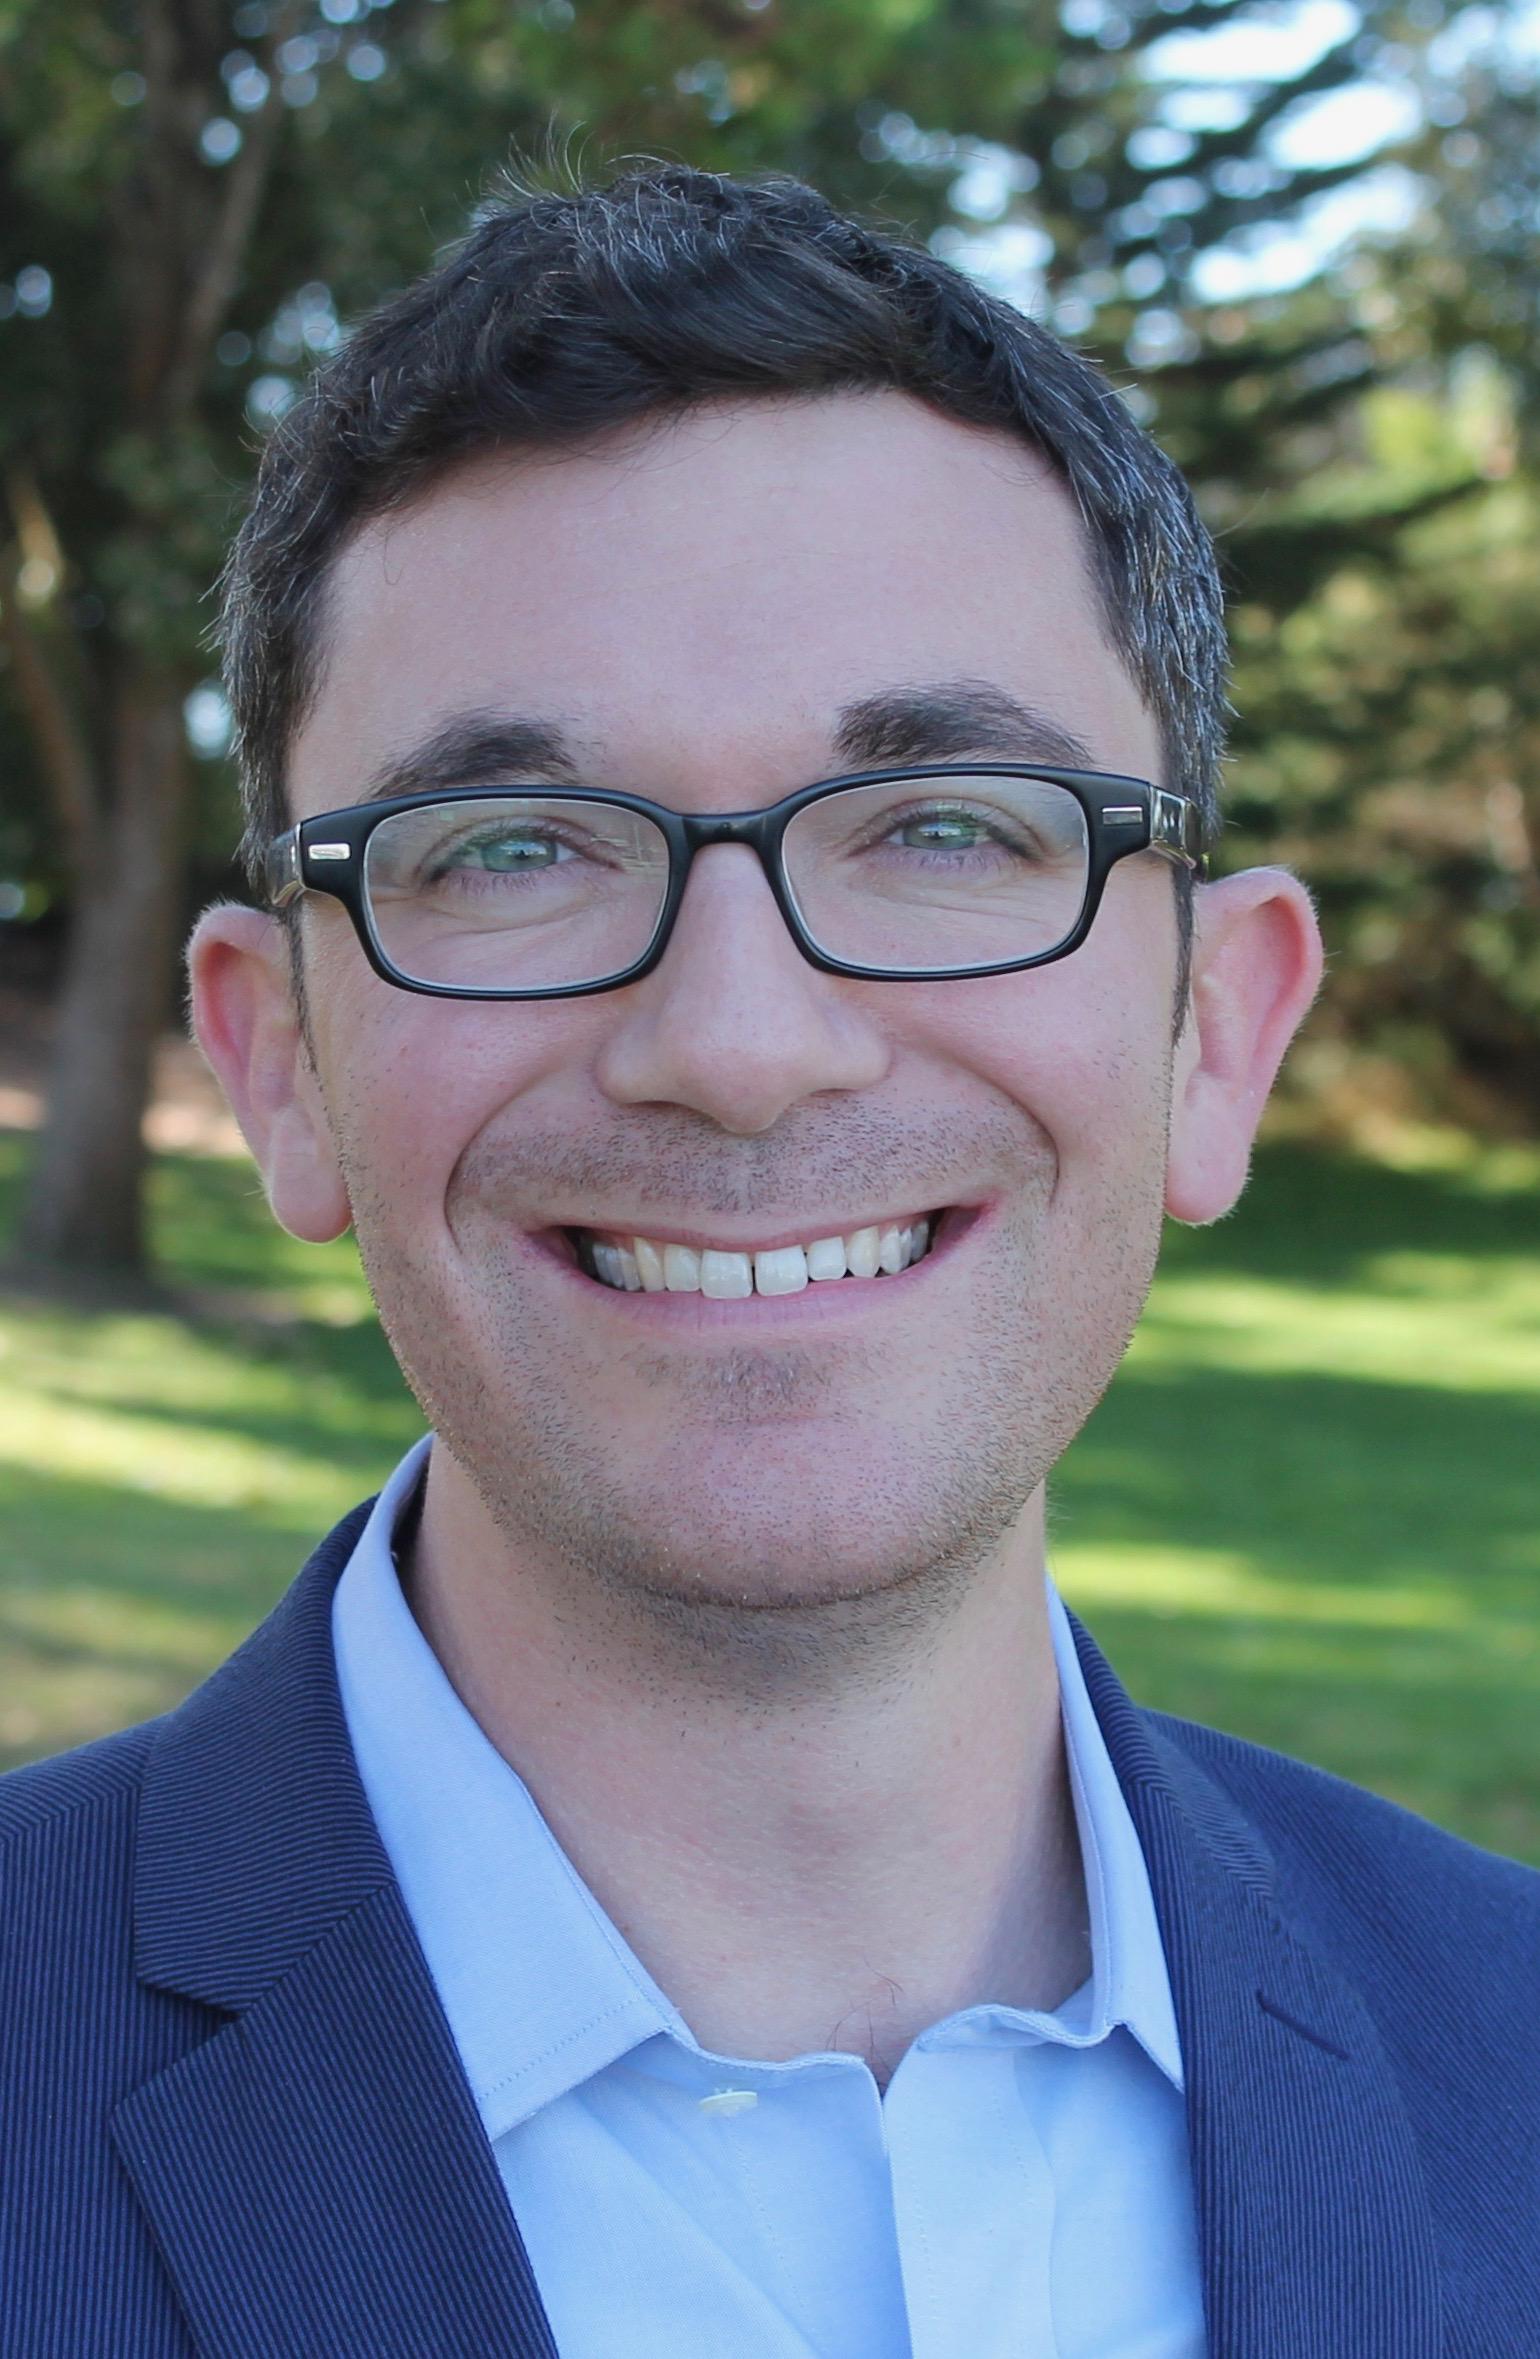 David Nahmias, Law Fellow at the Impact Fund